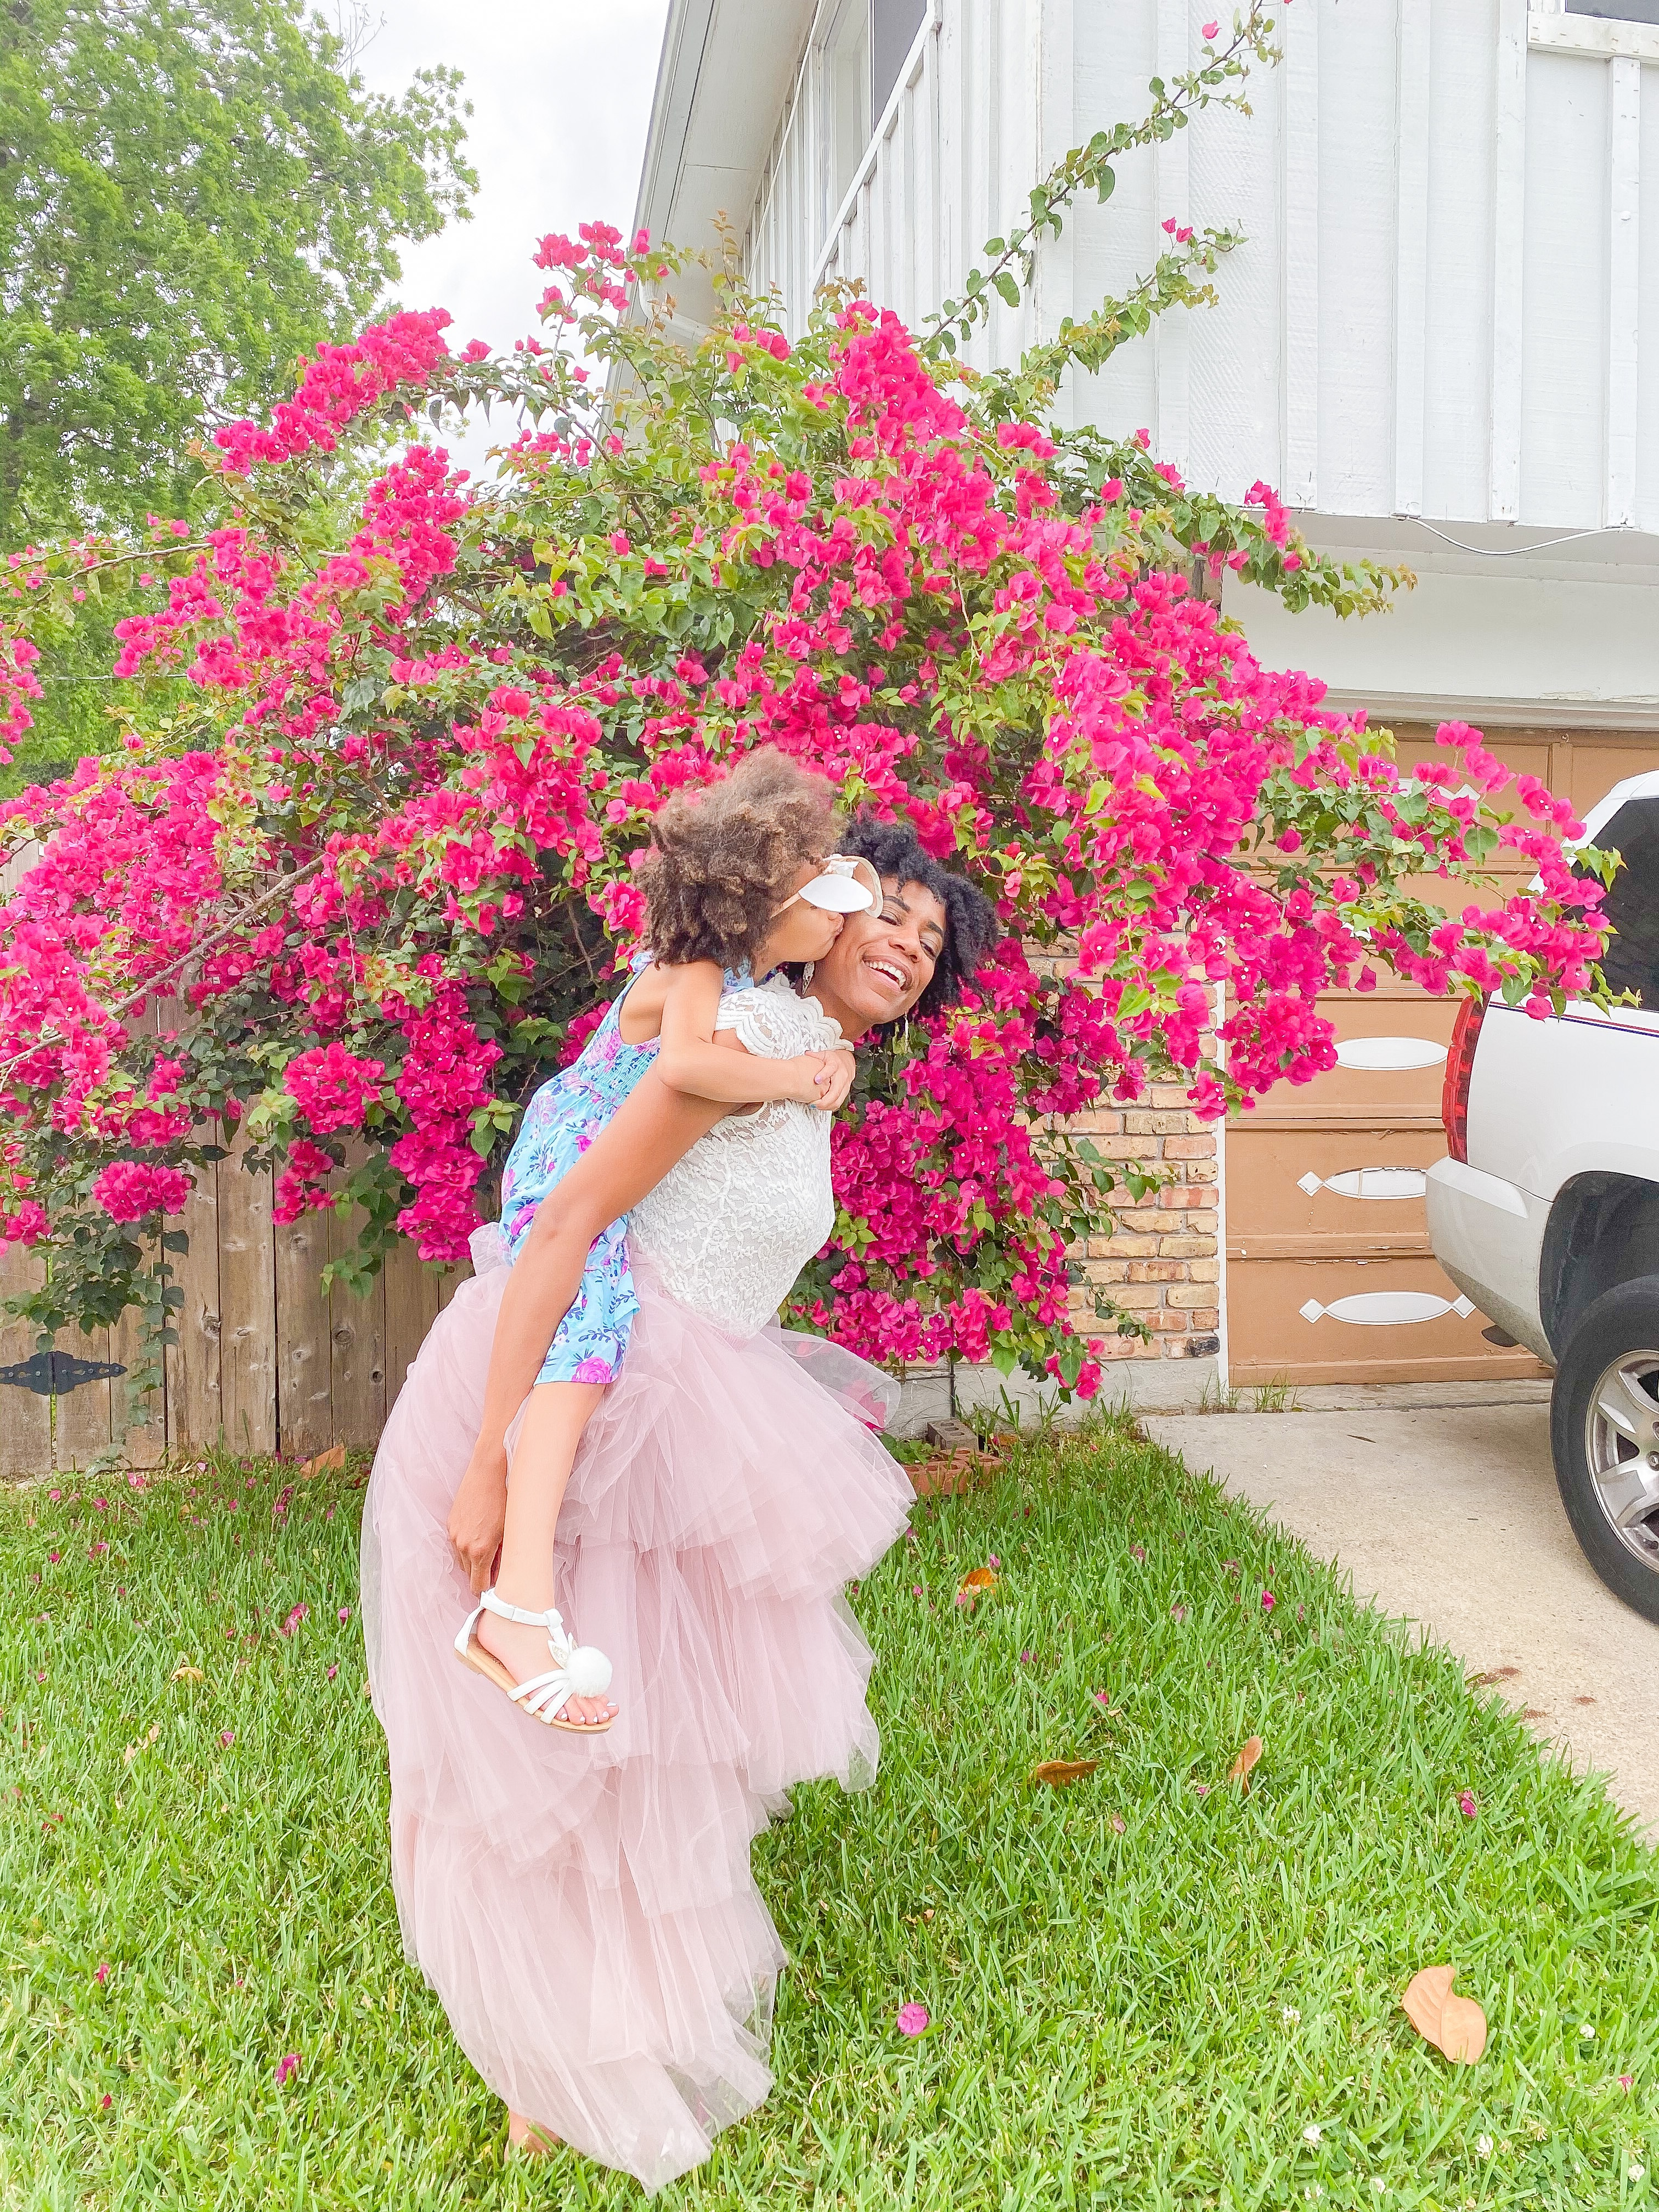 Flowers always make a family photo better. #familyphotoideas #familyphotos #motherdaughterphoto #photosathome #kissesphoto #flowerphotography